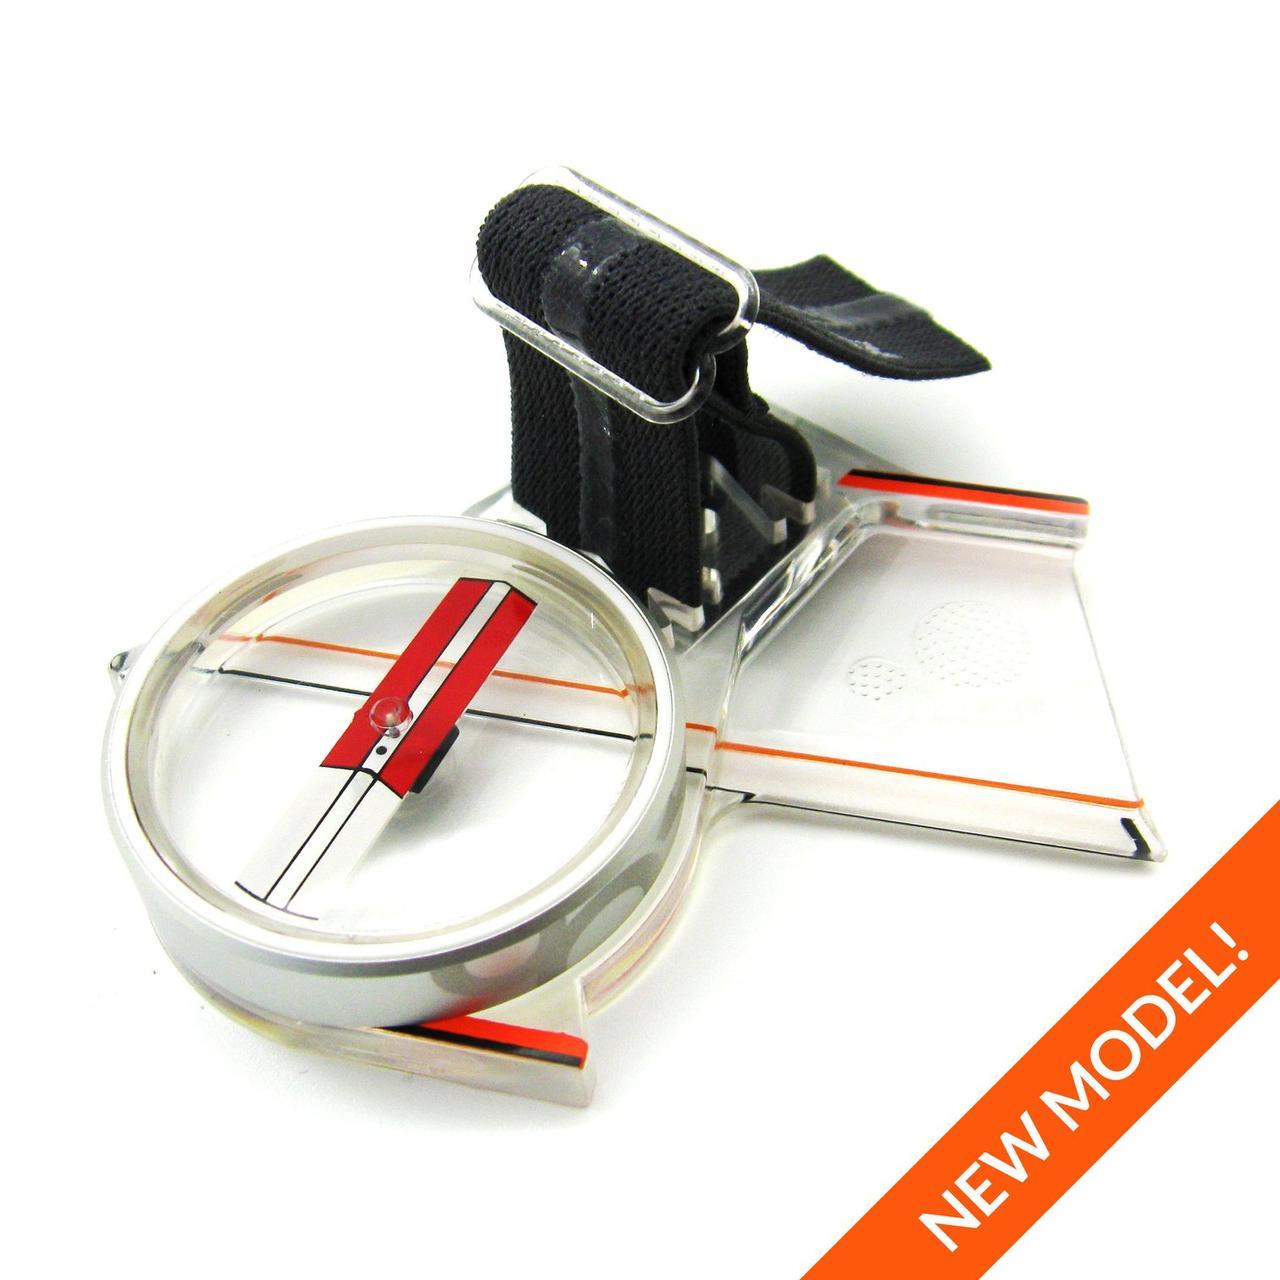 Str8 Kompakt Compass